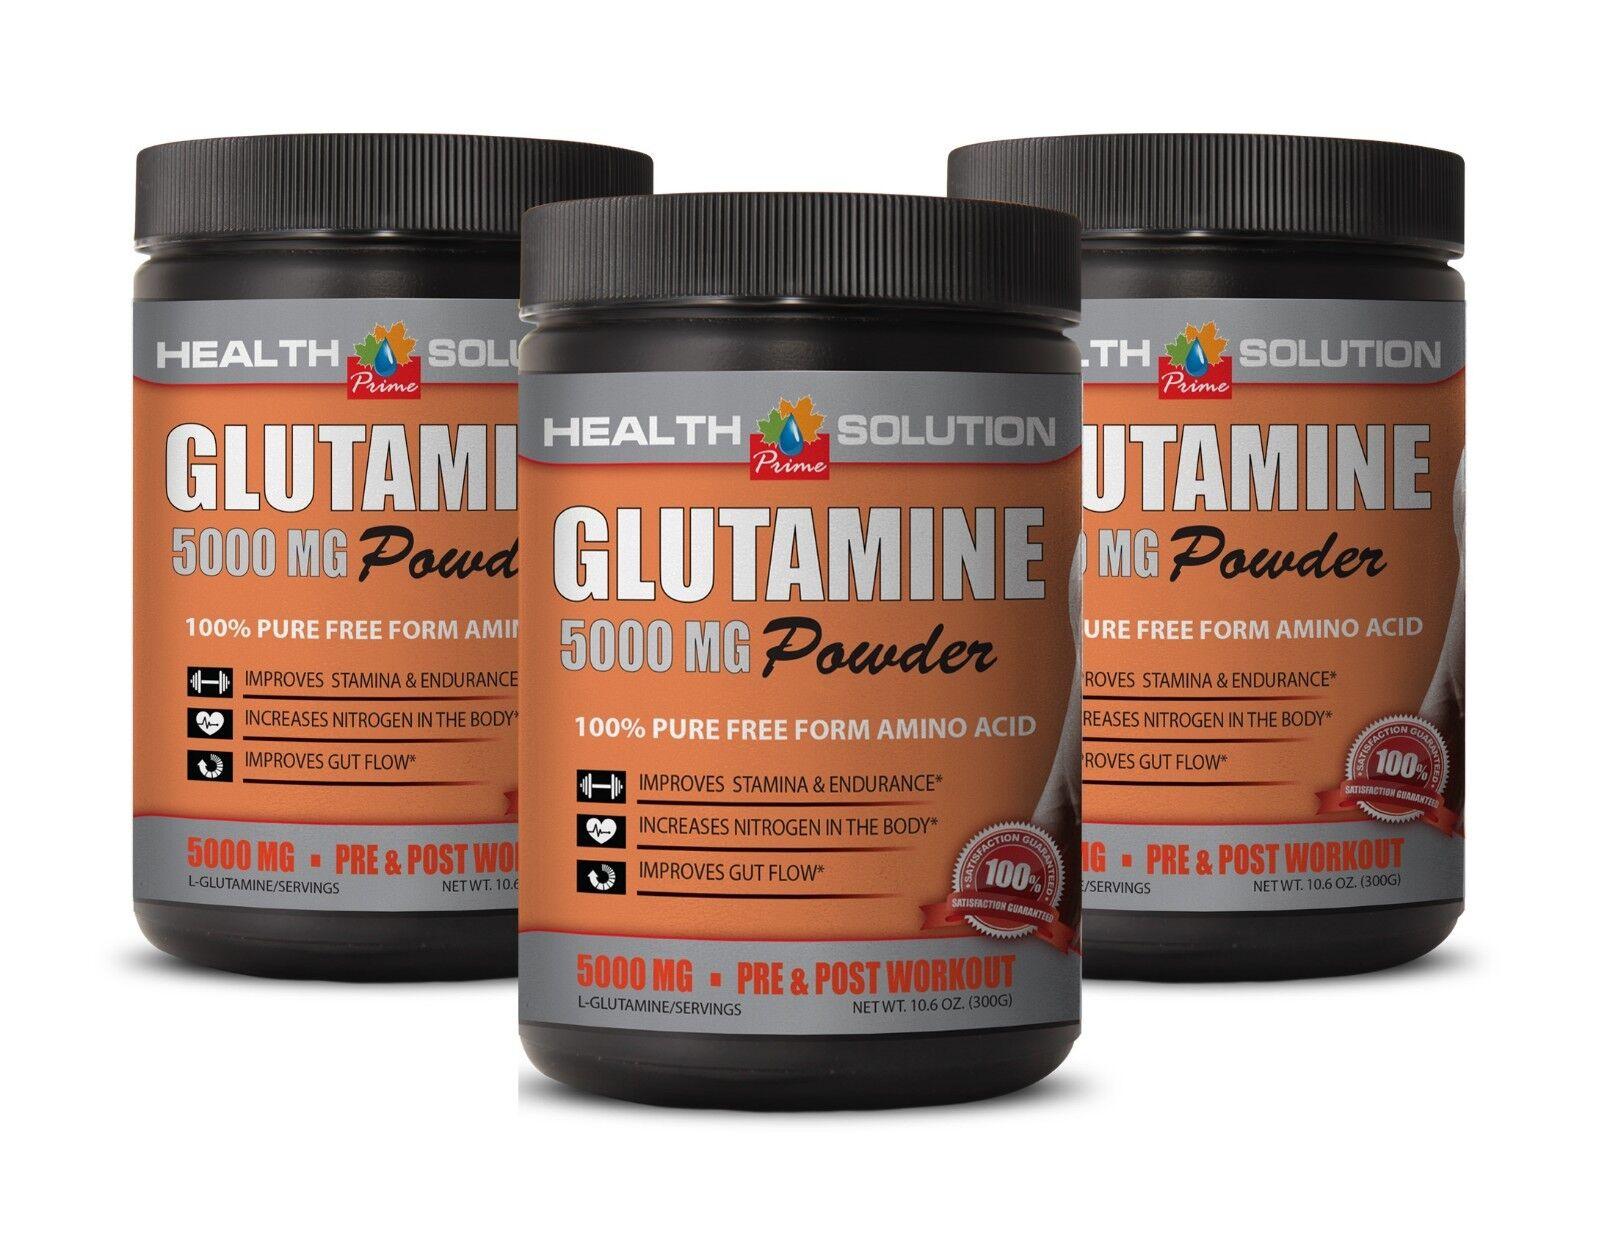 Muscle supplements - GLUTAMINE POWDER 5000MG 3B - l-glutamine life extension